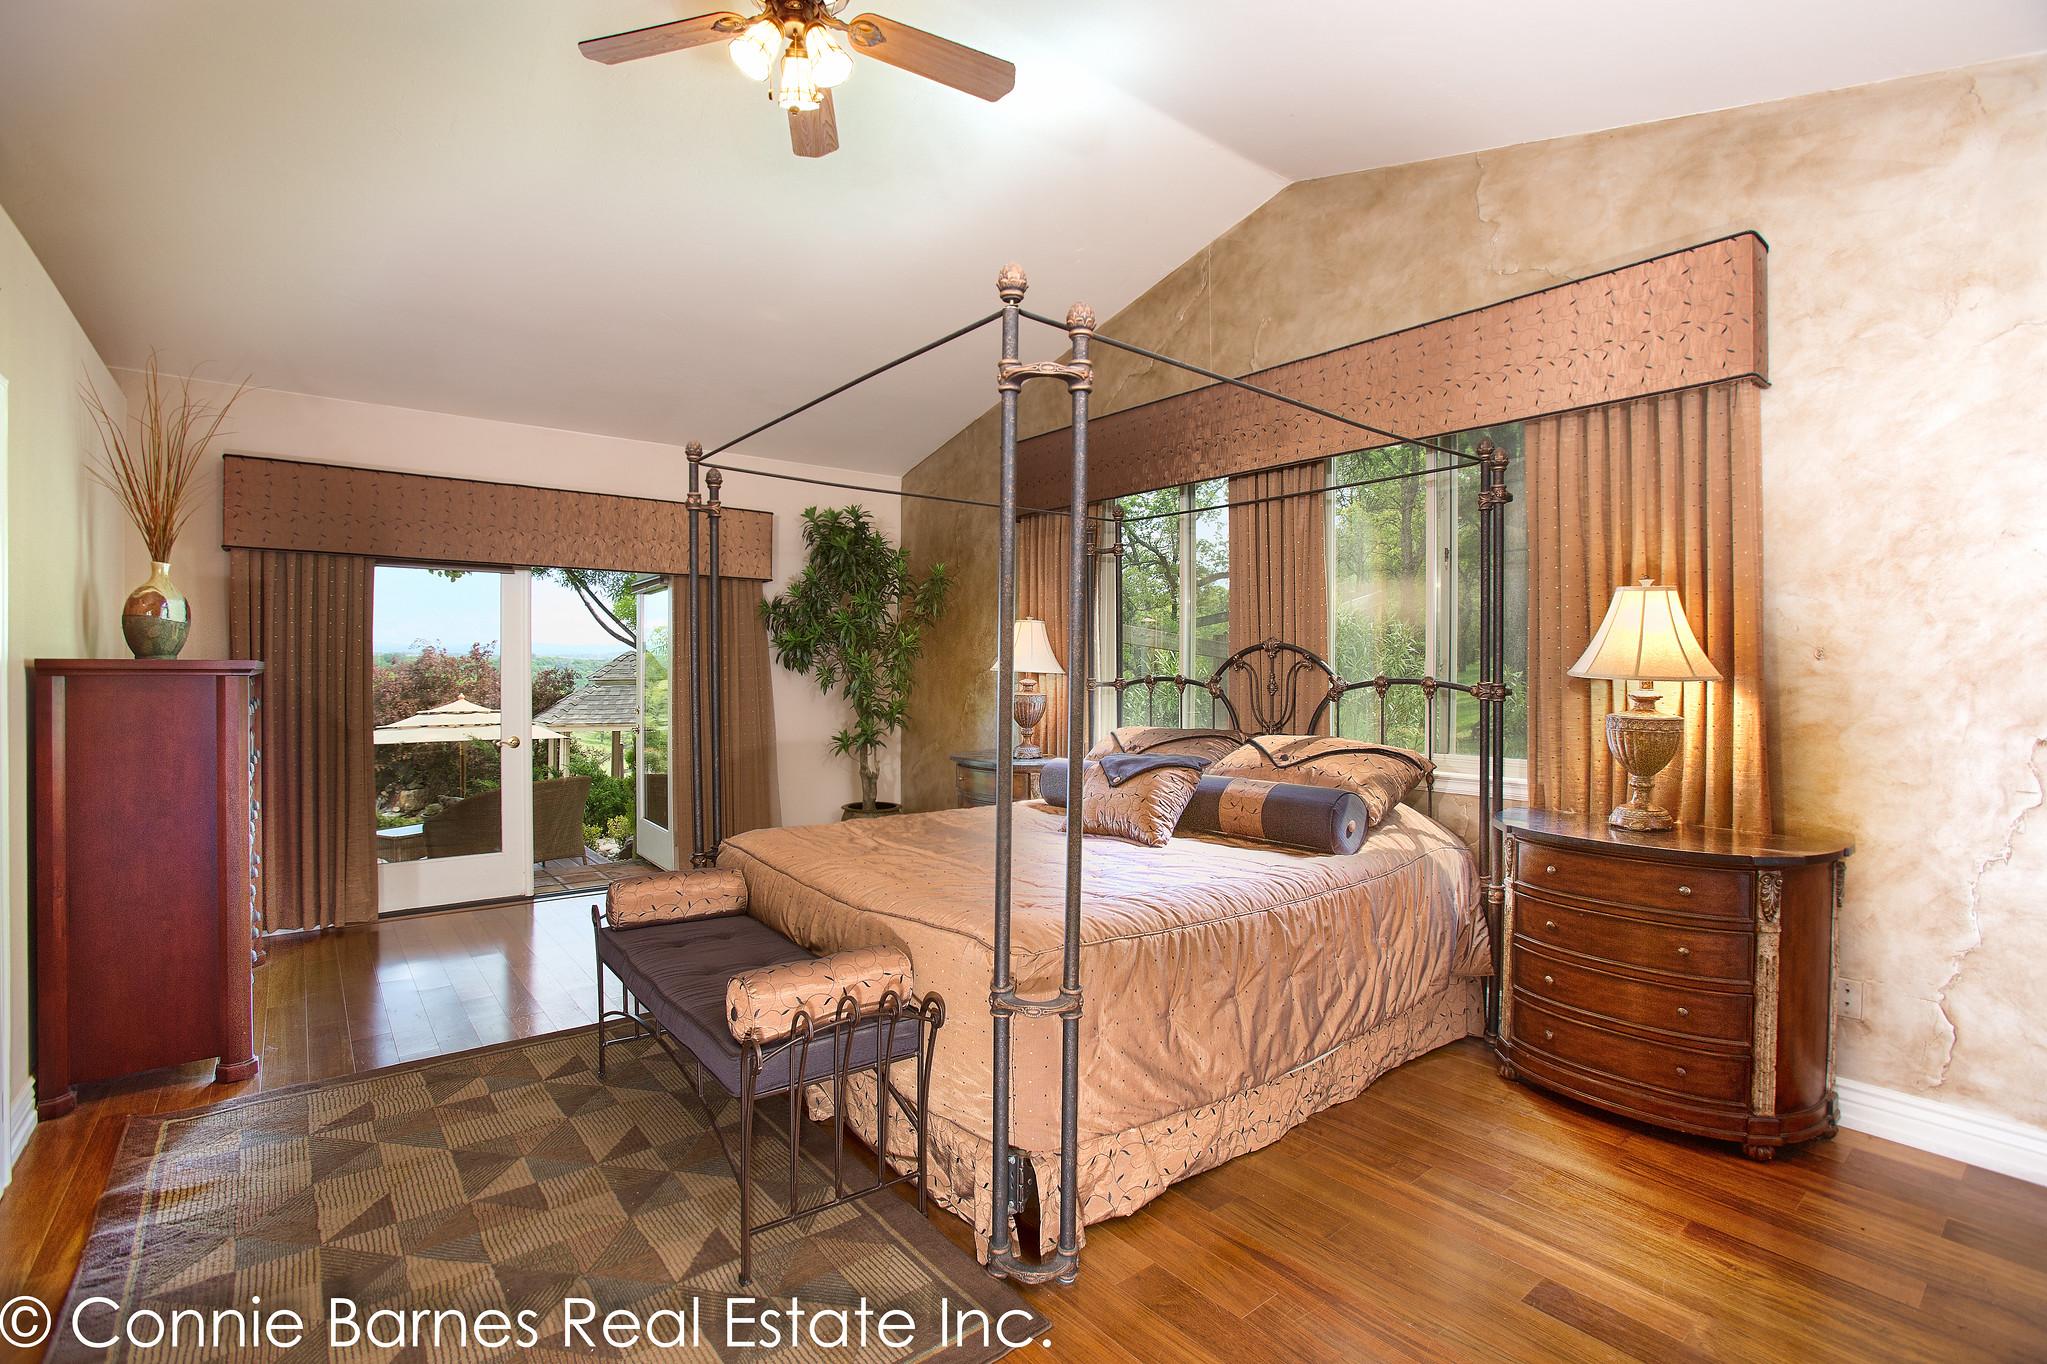 Sold By Connie Barnes Real Estate 3322 Diablo Trail